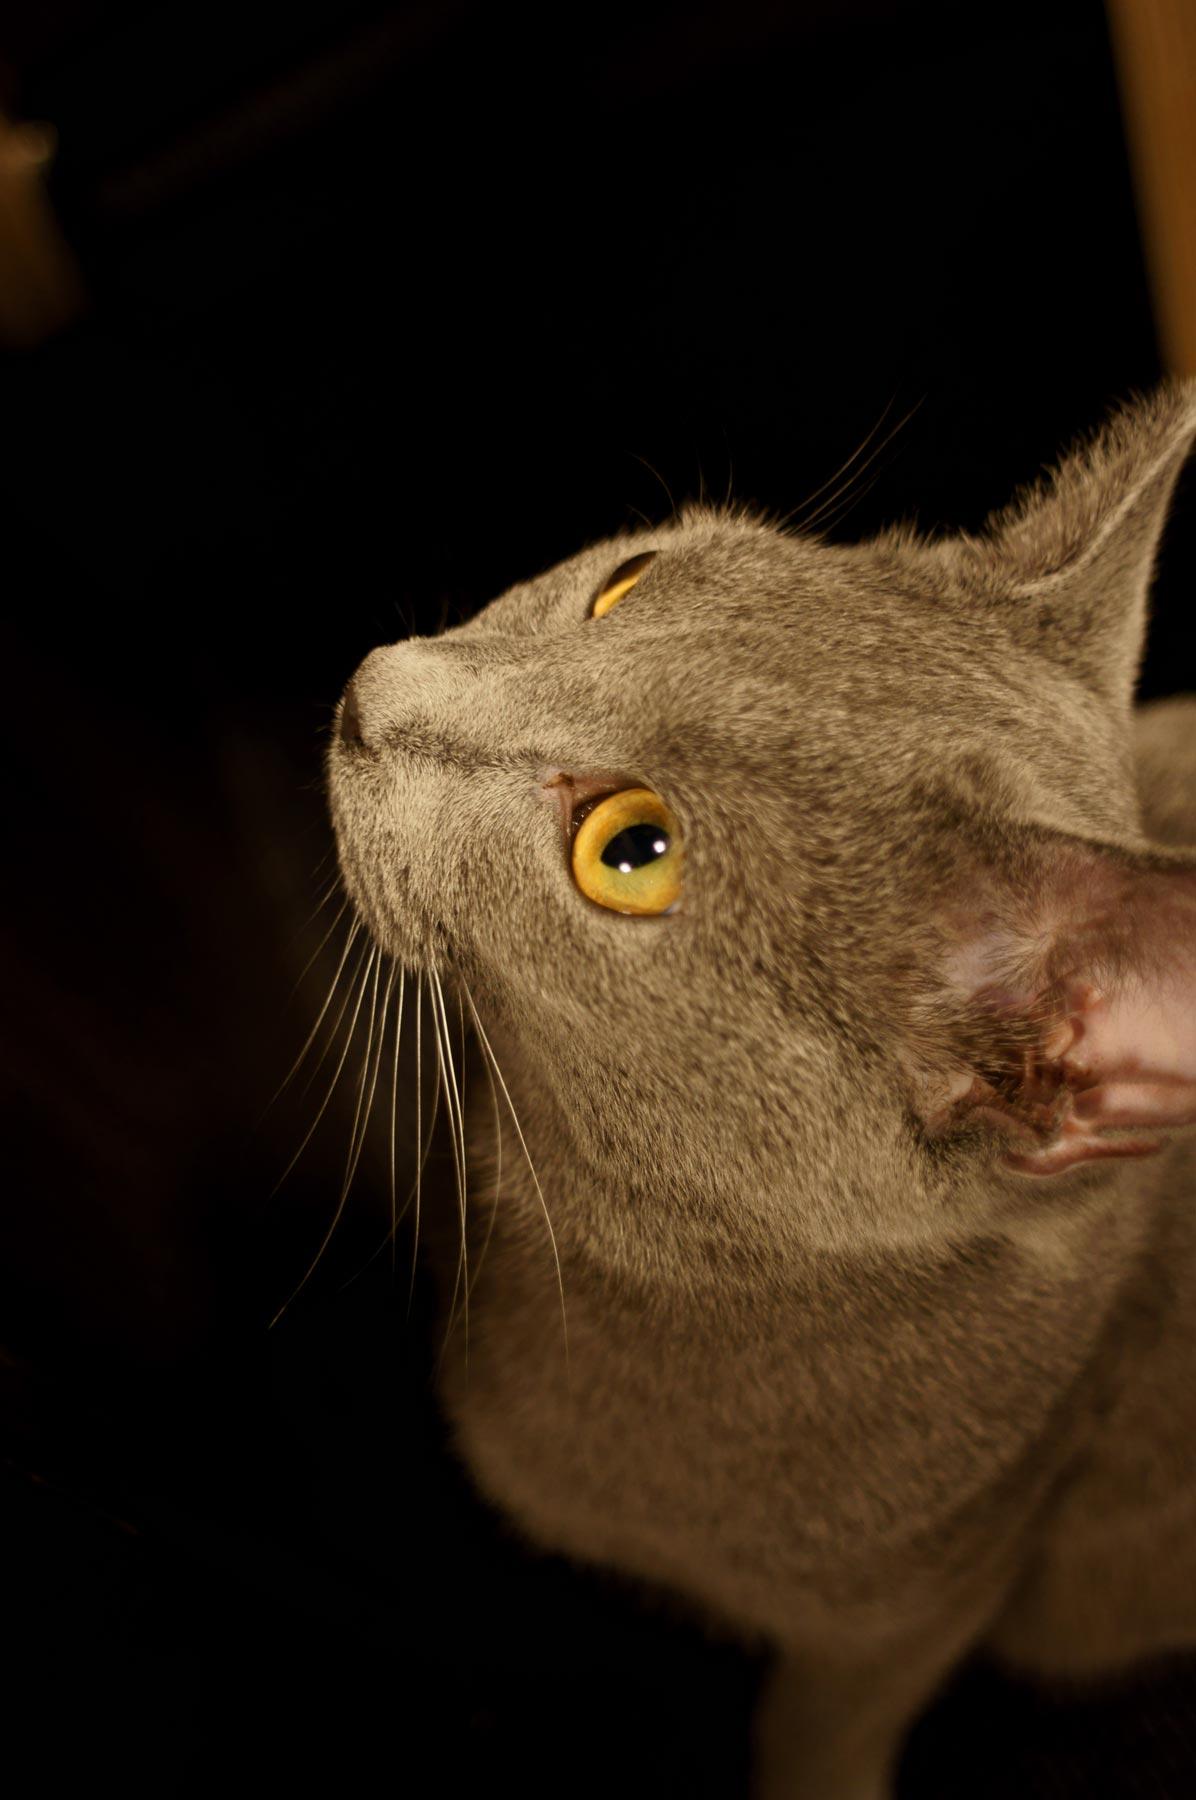 AF24mmF2.8で猫写真_e0216133_22541511.jpg